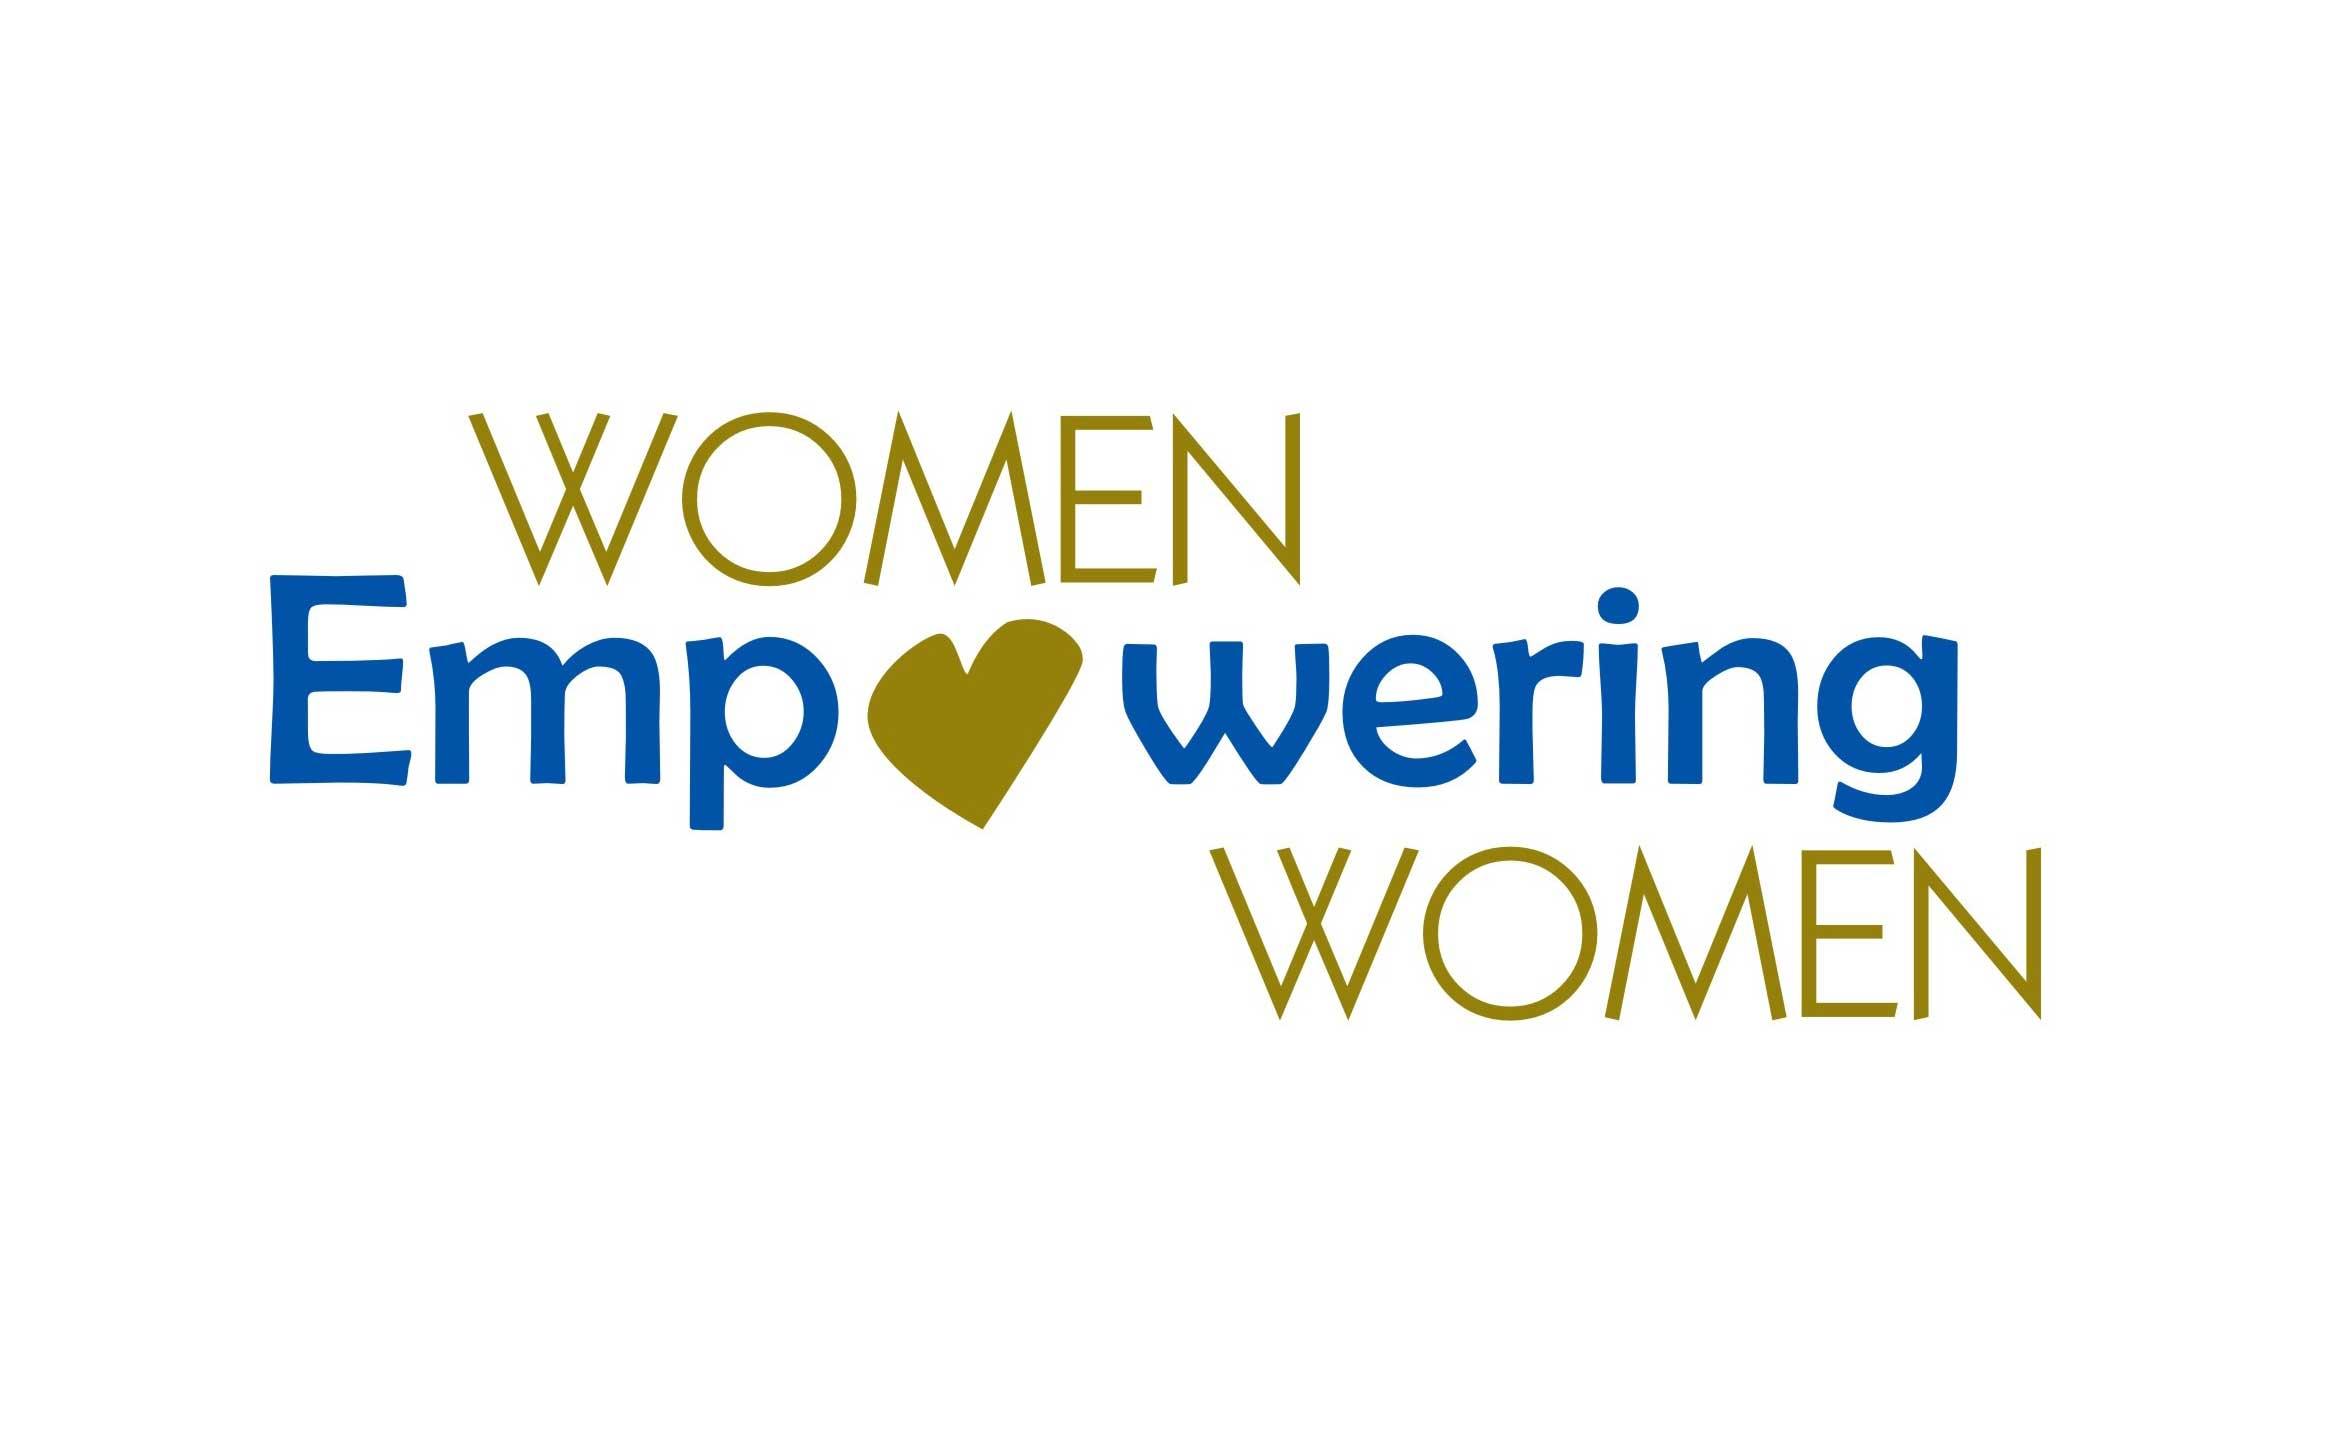 Women Empowering Women :: Stamford, CT | itsrelevant.com